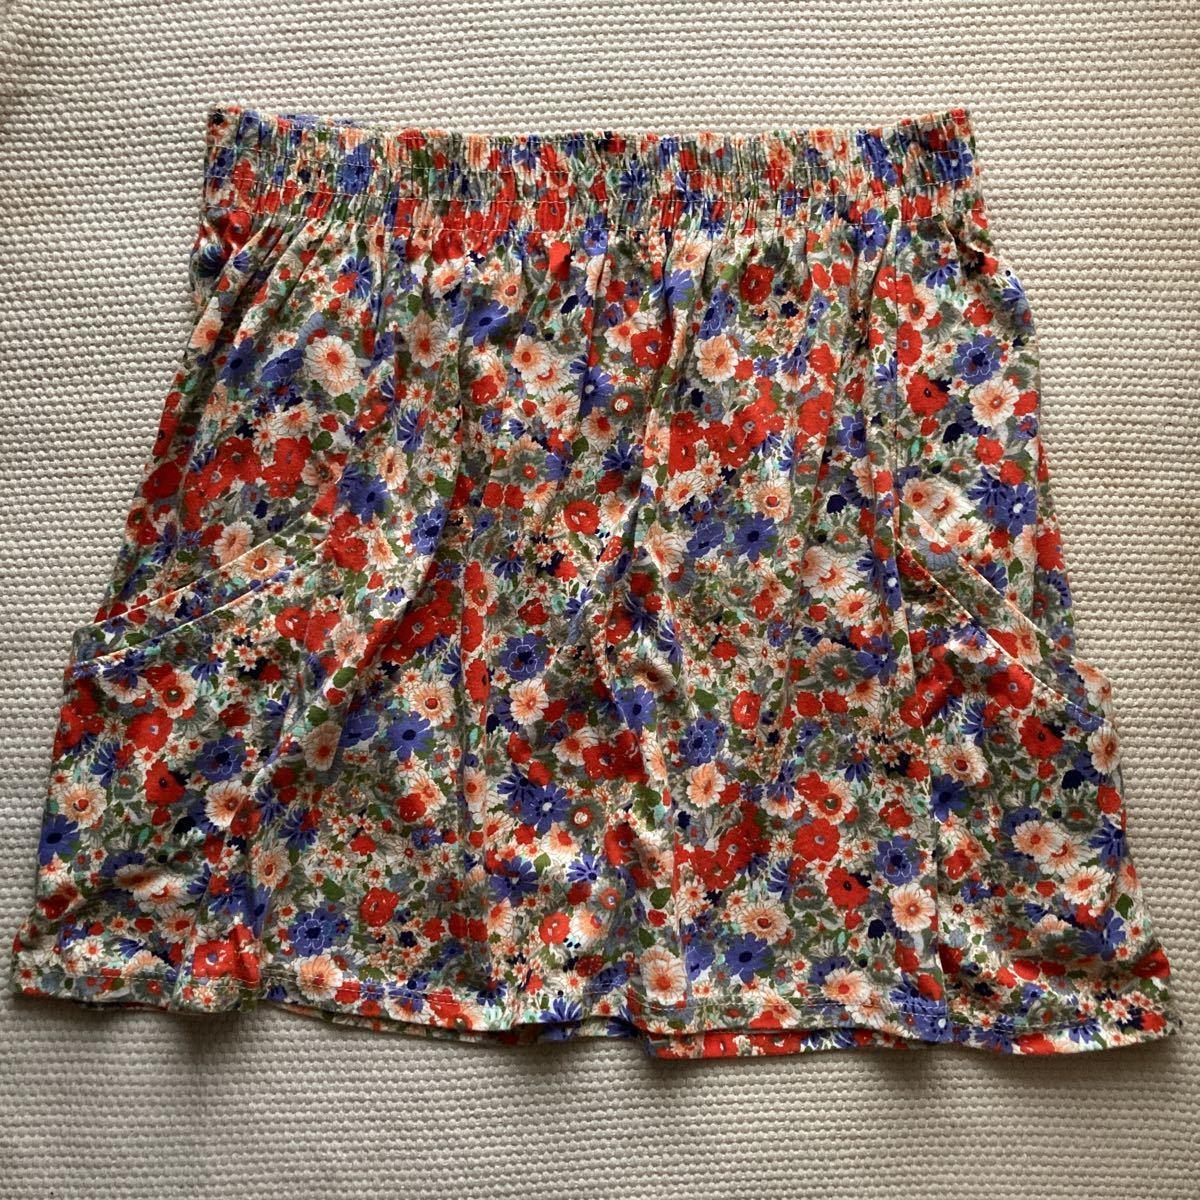 ZARA ザラ 花柄スカート フレアスカート GAP ギャップ ミニスカート H&M ユニクロ GU ジーユー